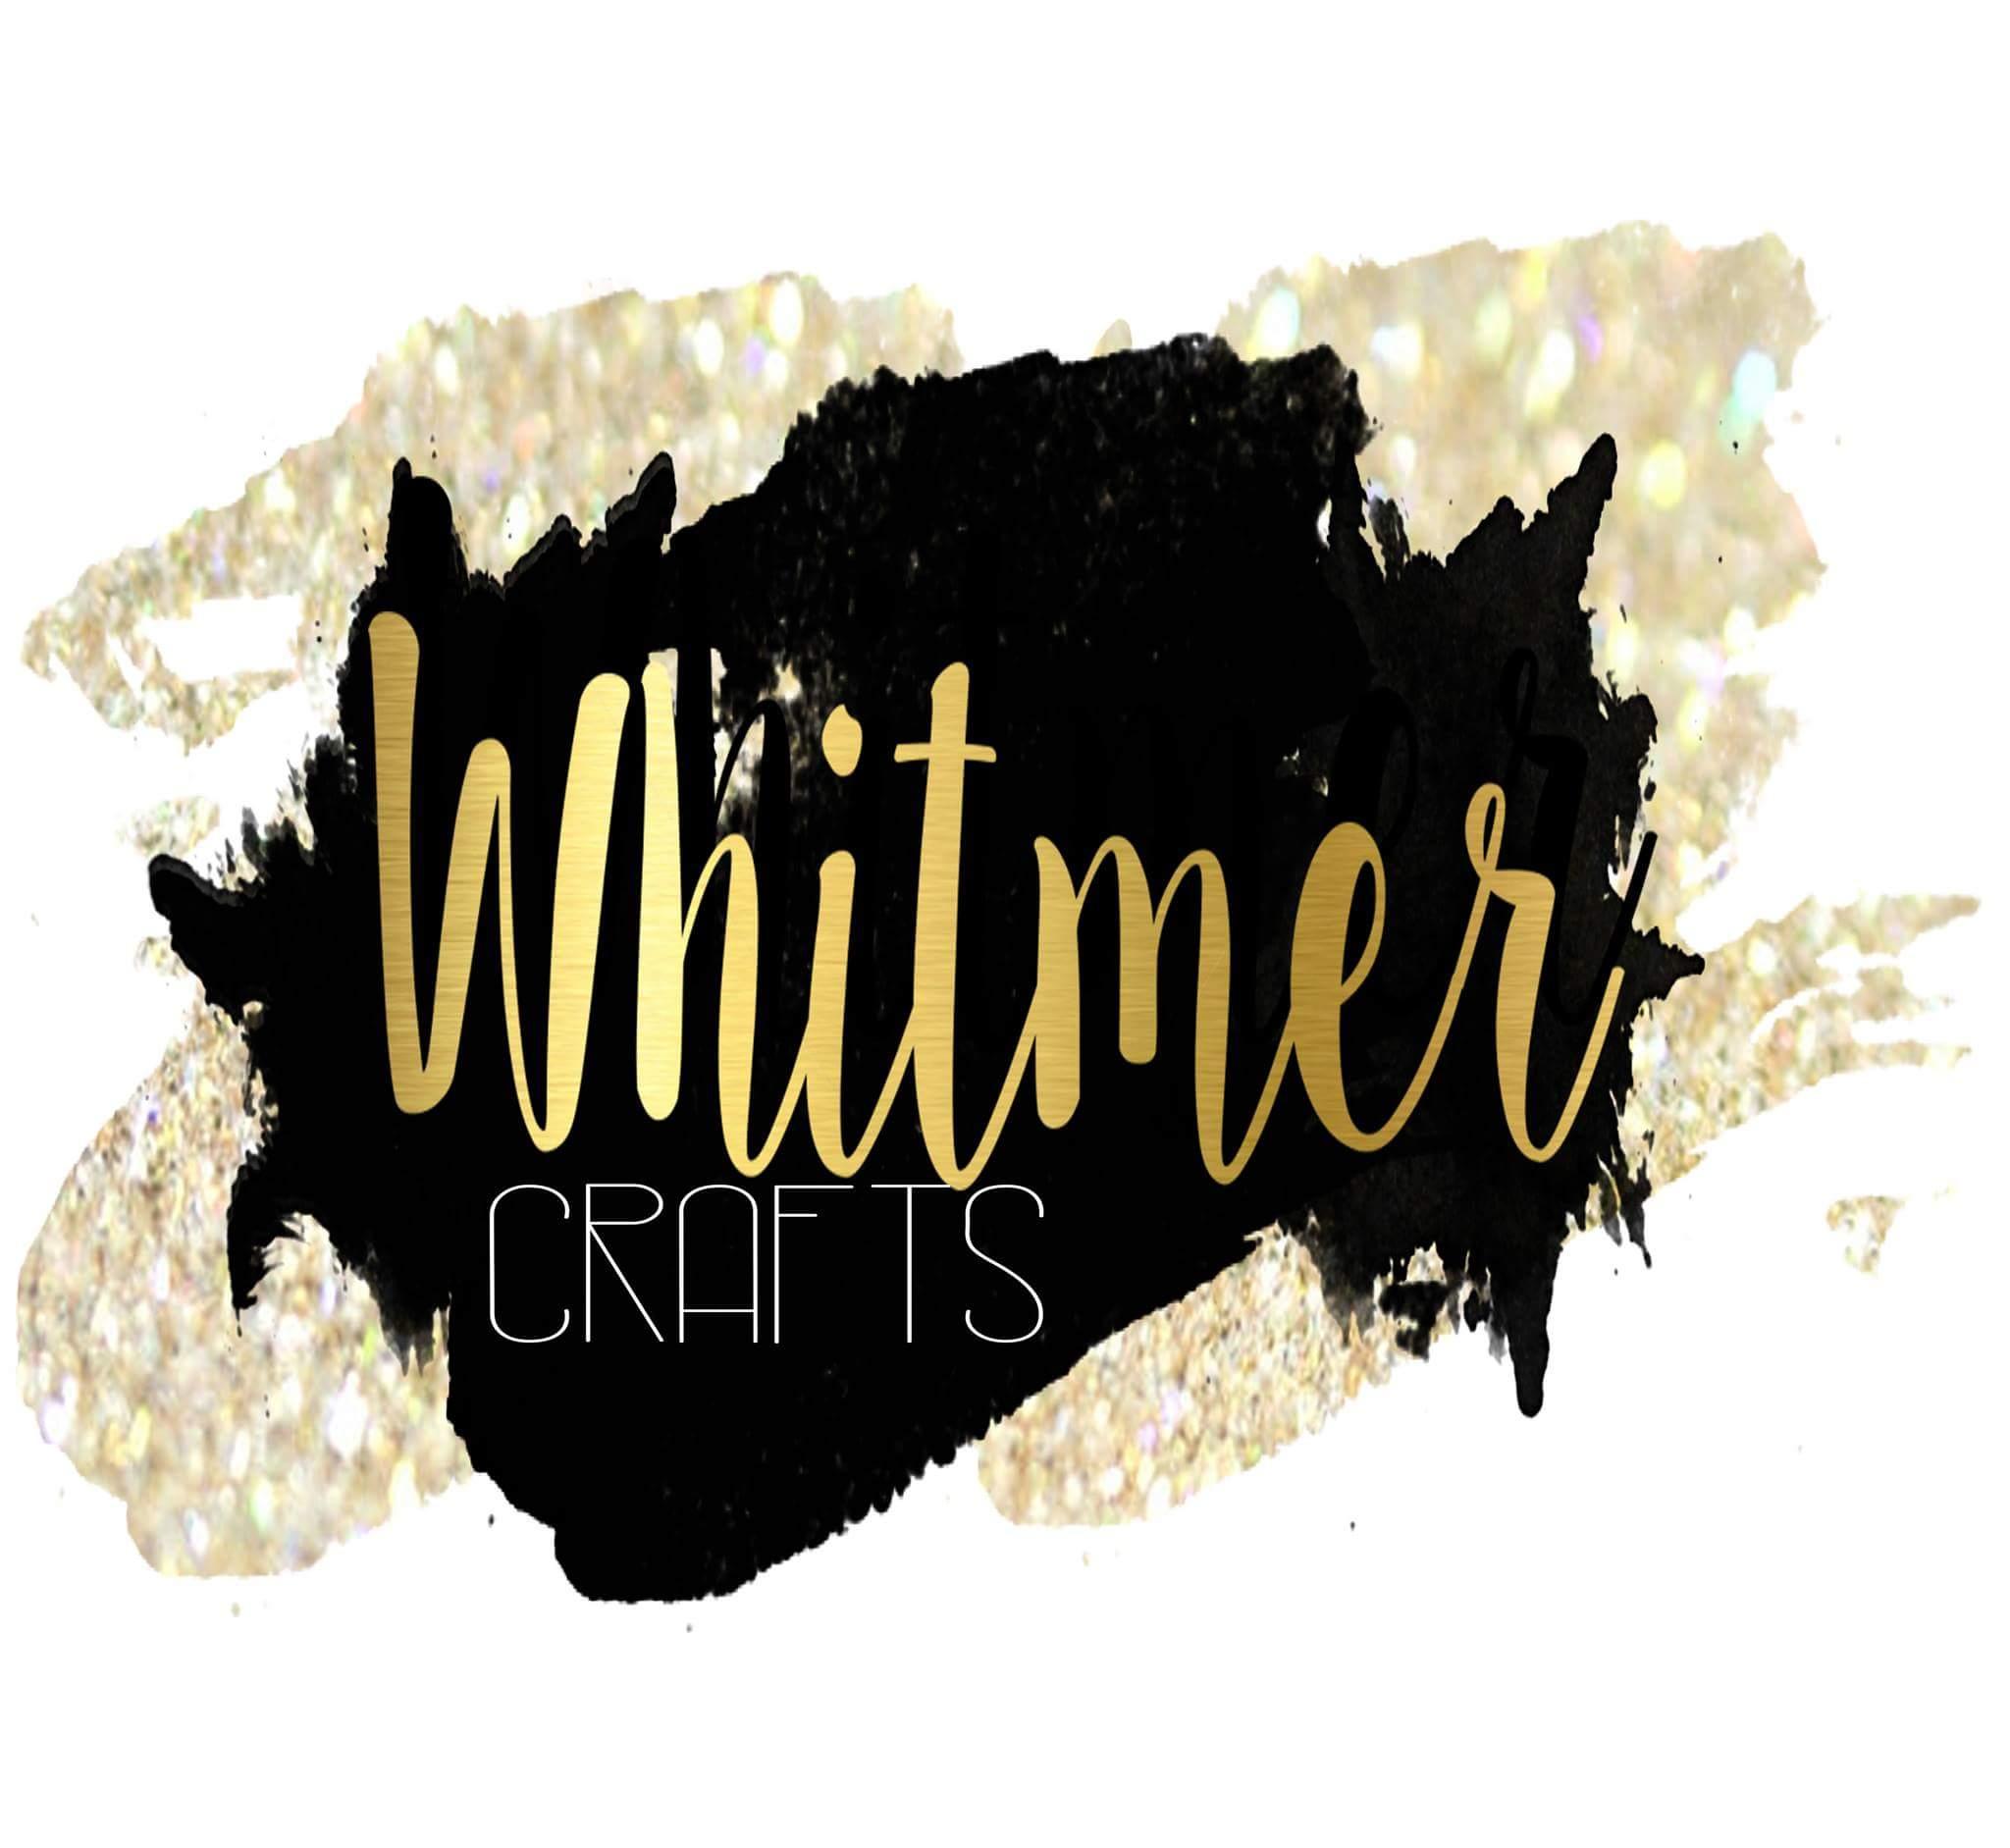 WhitmerCrafts